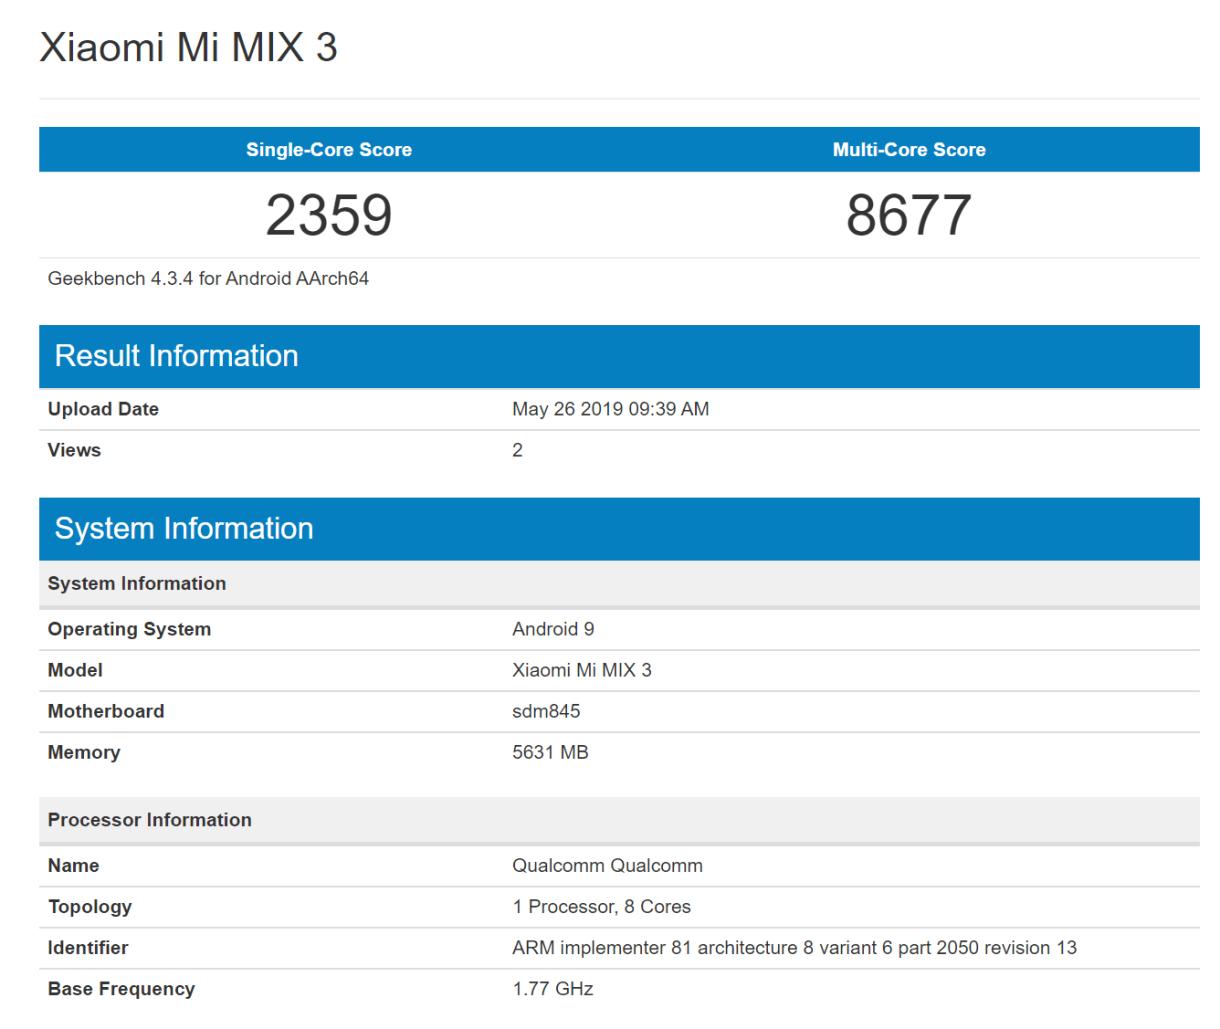 Xiaomi Mi MIX 3 Geekbench Score